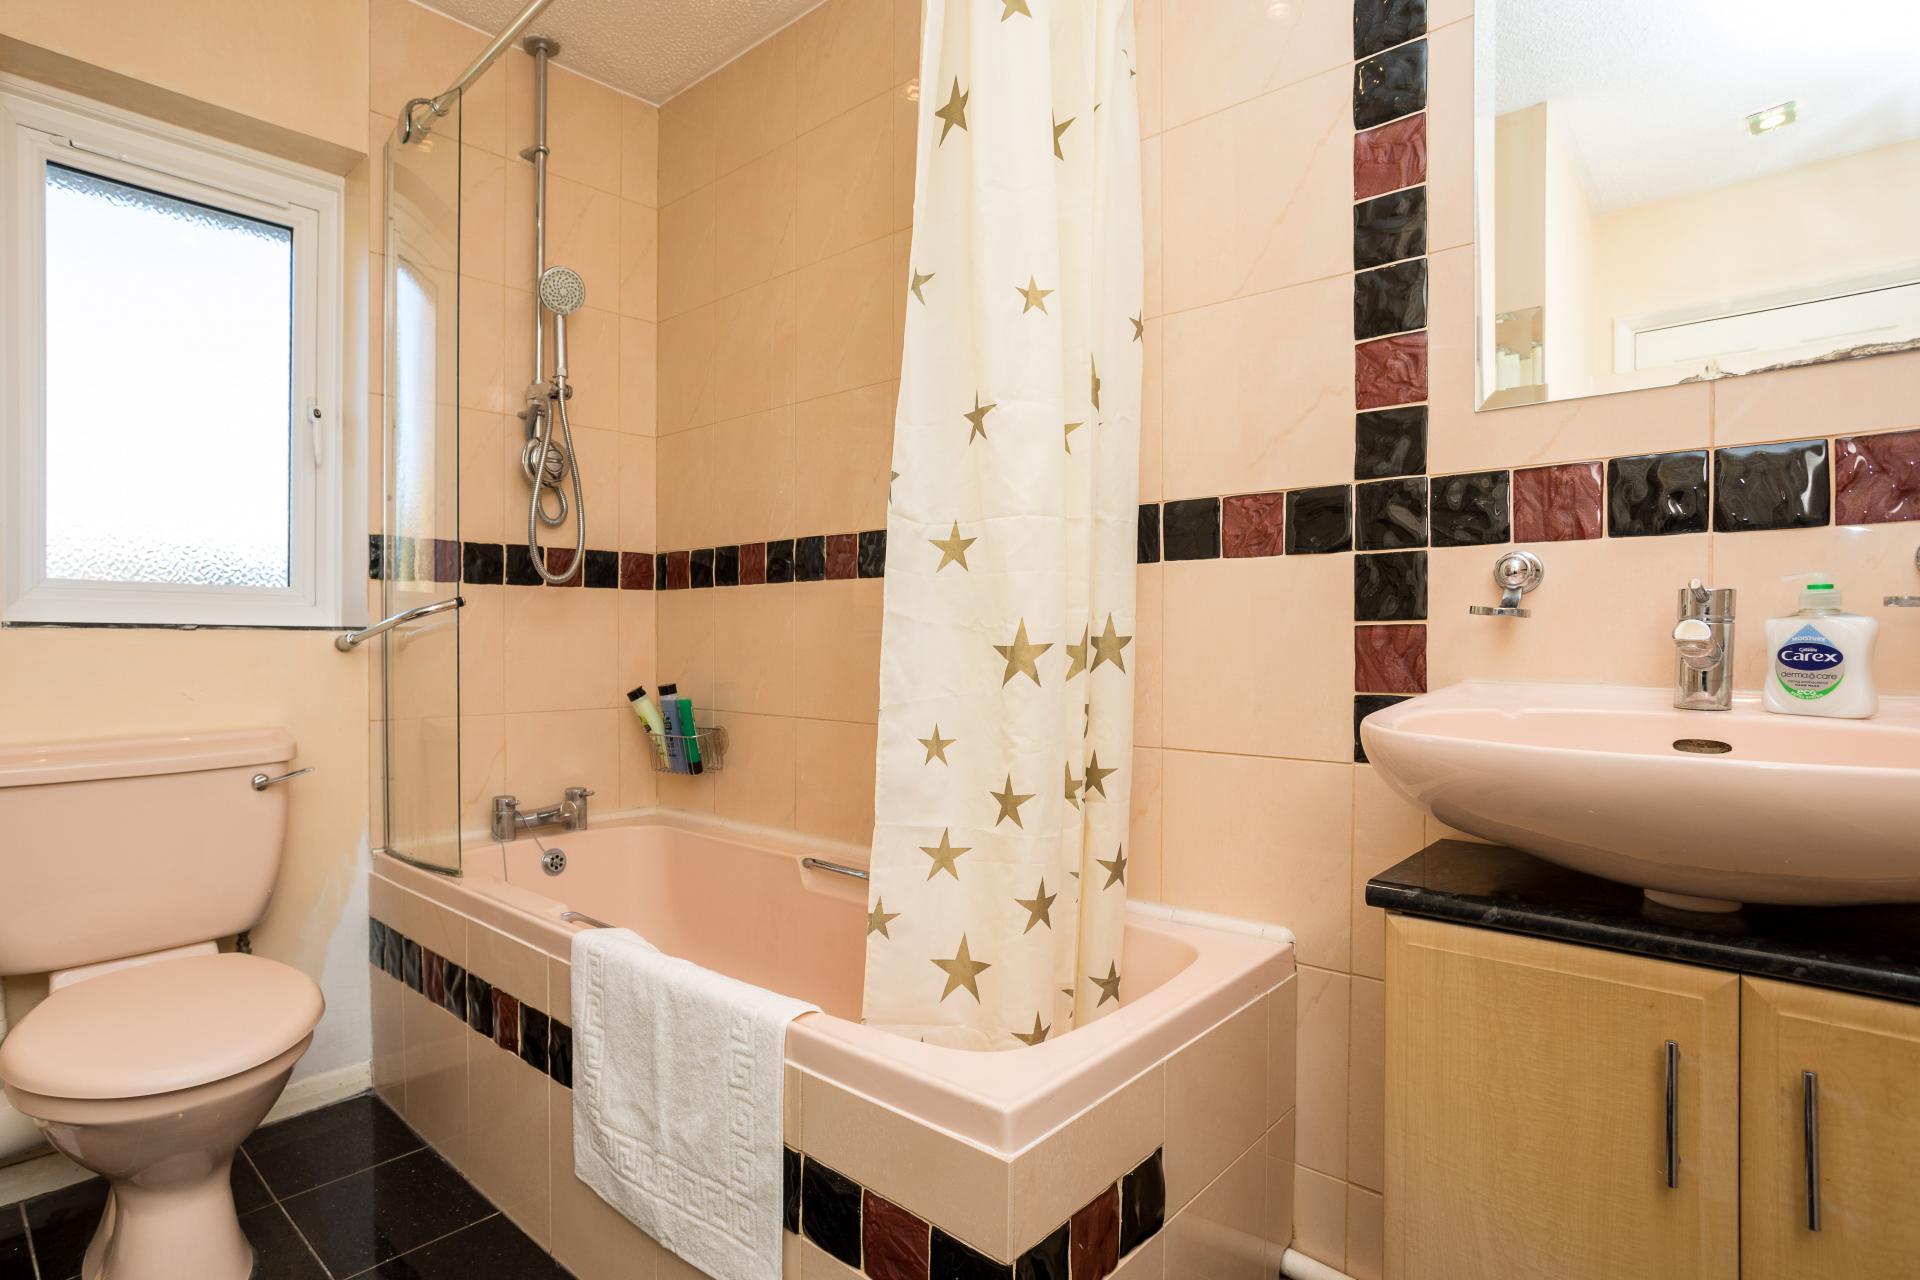 Bath at Graveney House, Maidenbower, Crawley